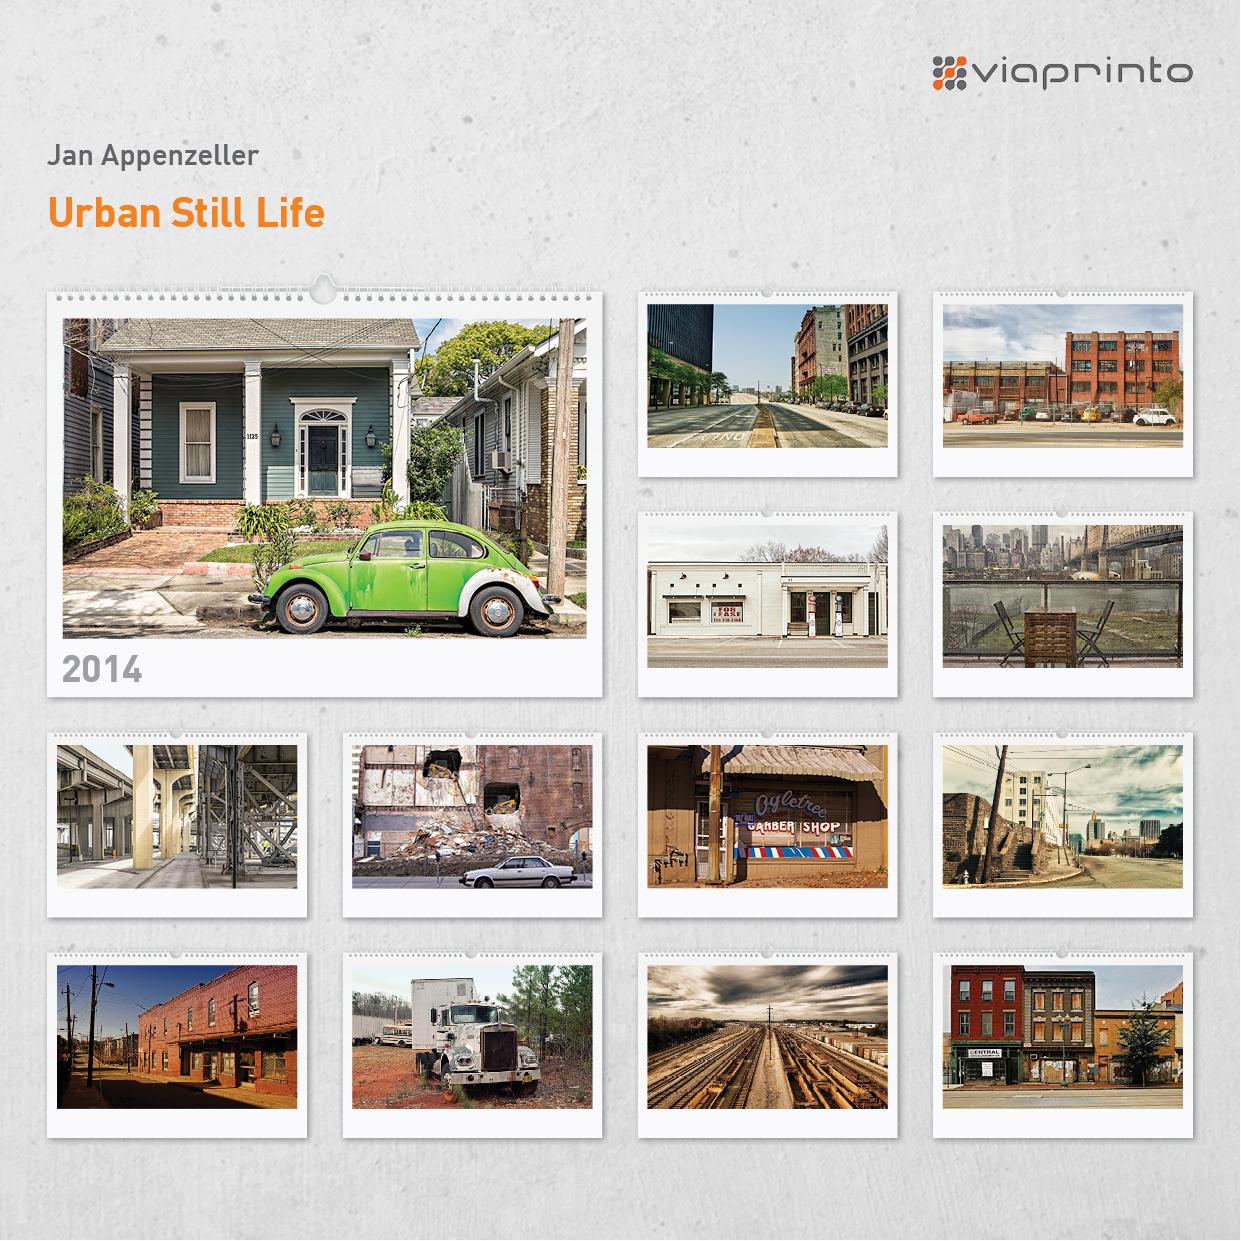 https://www.viaprinto.de/motivkalender#/urban_still_life